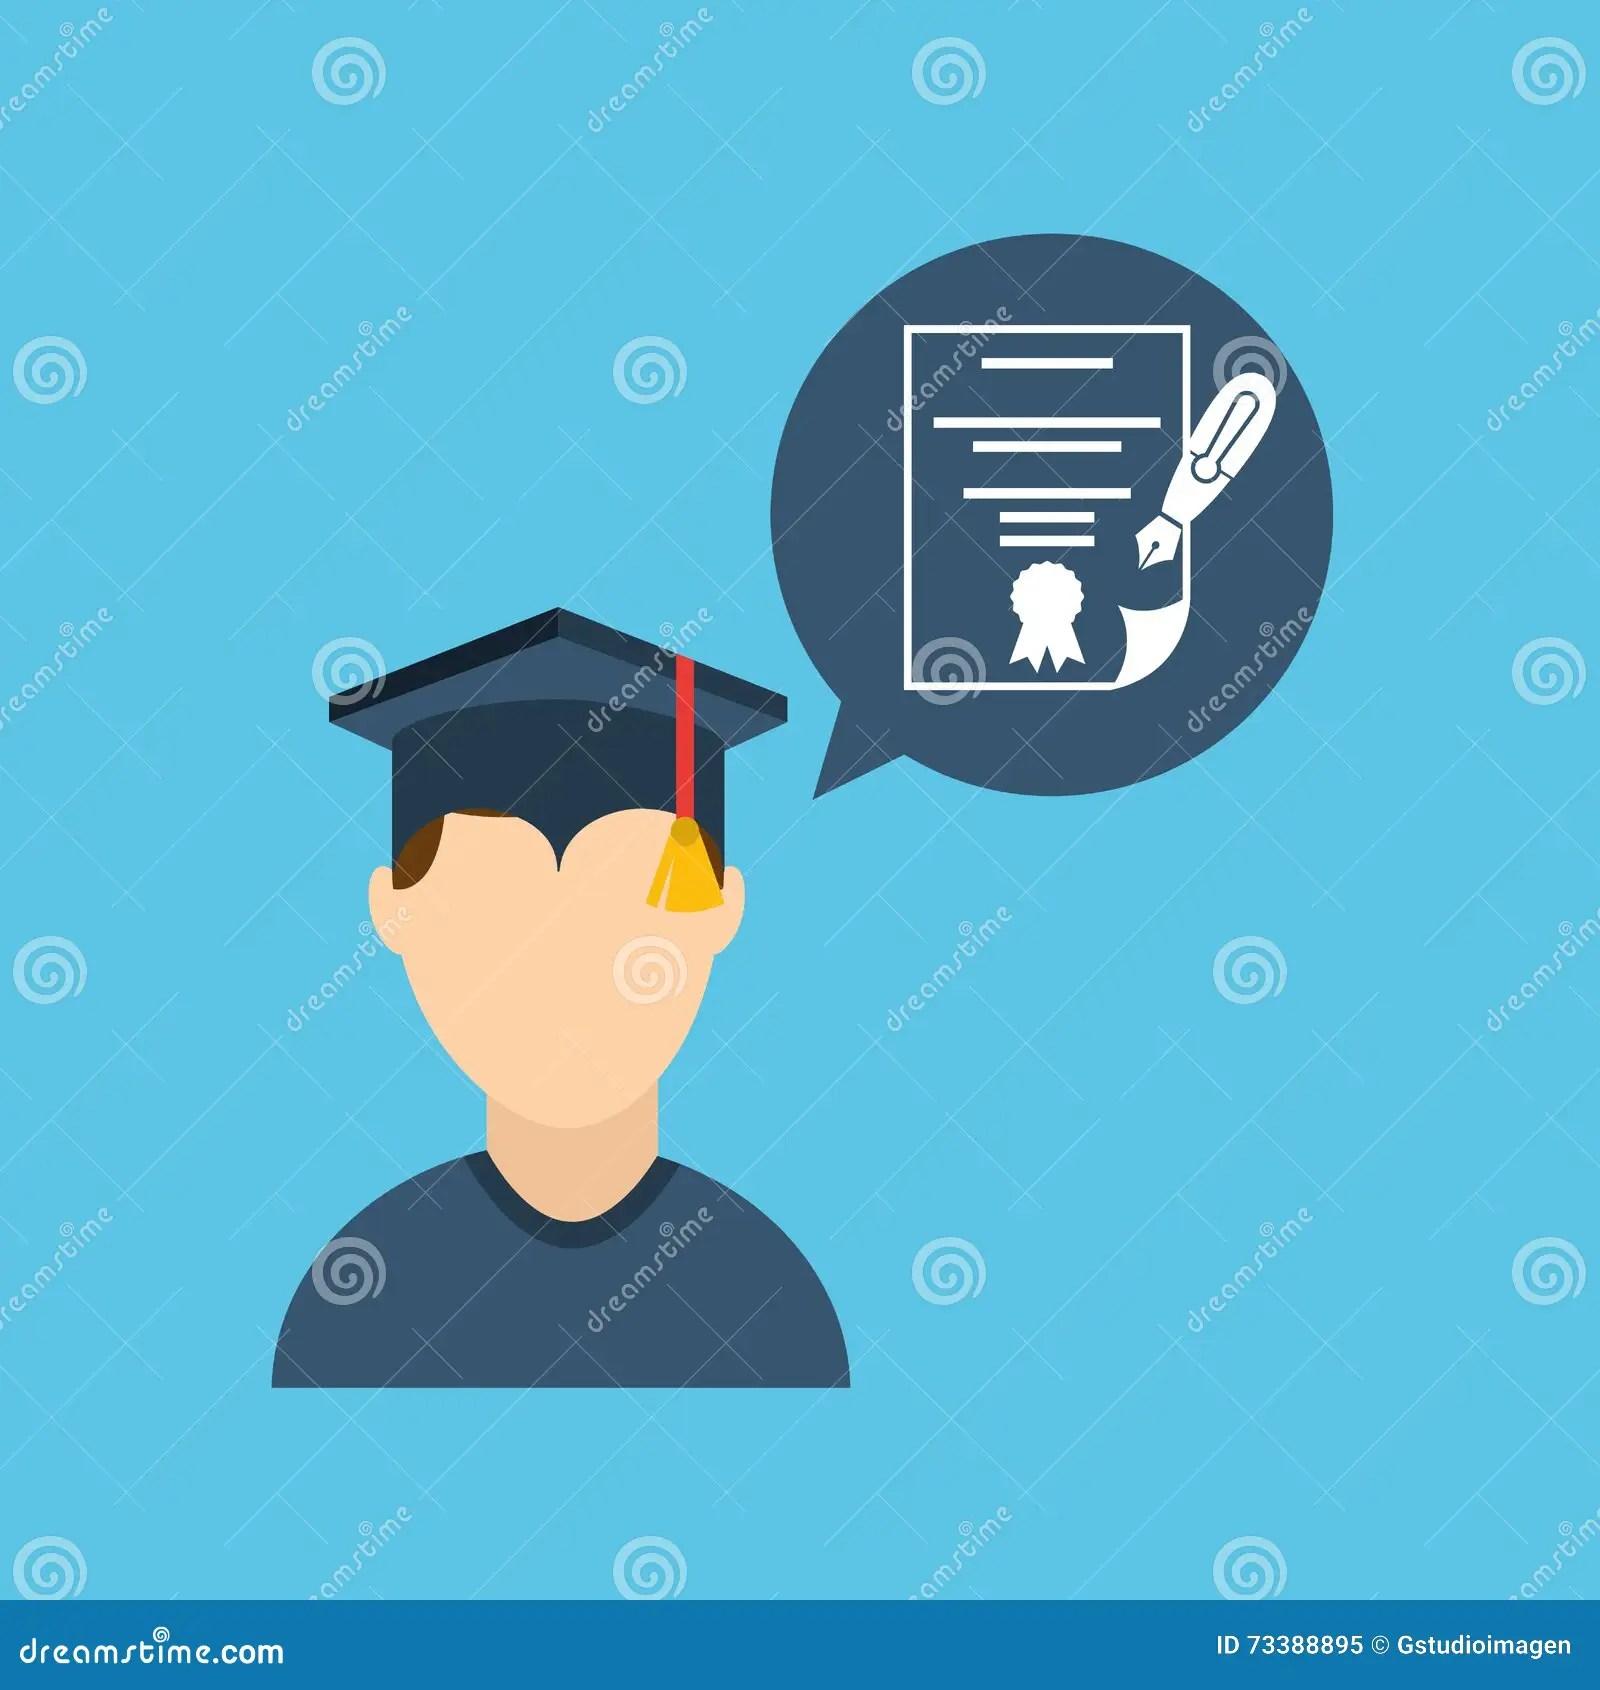 Graduation Celebration Design Stock Illustration - Illustration of